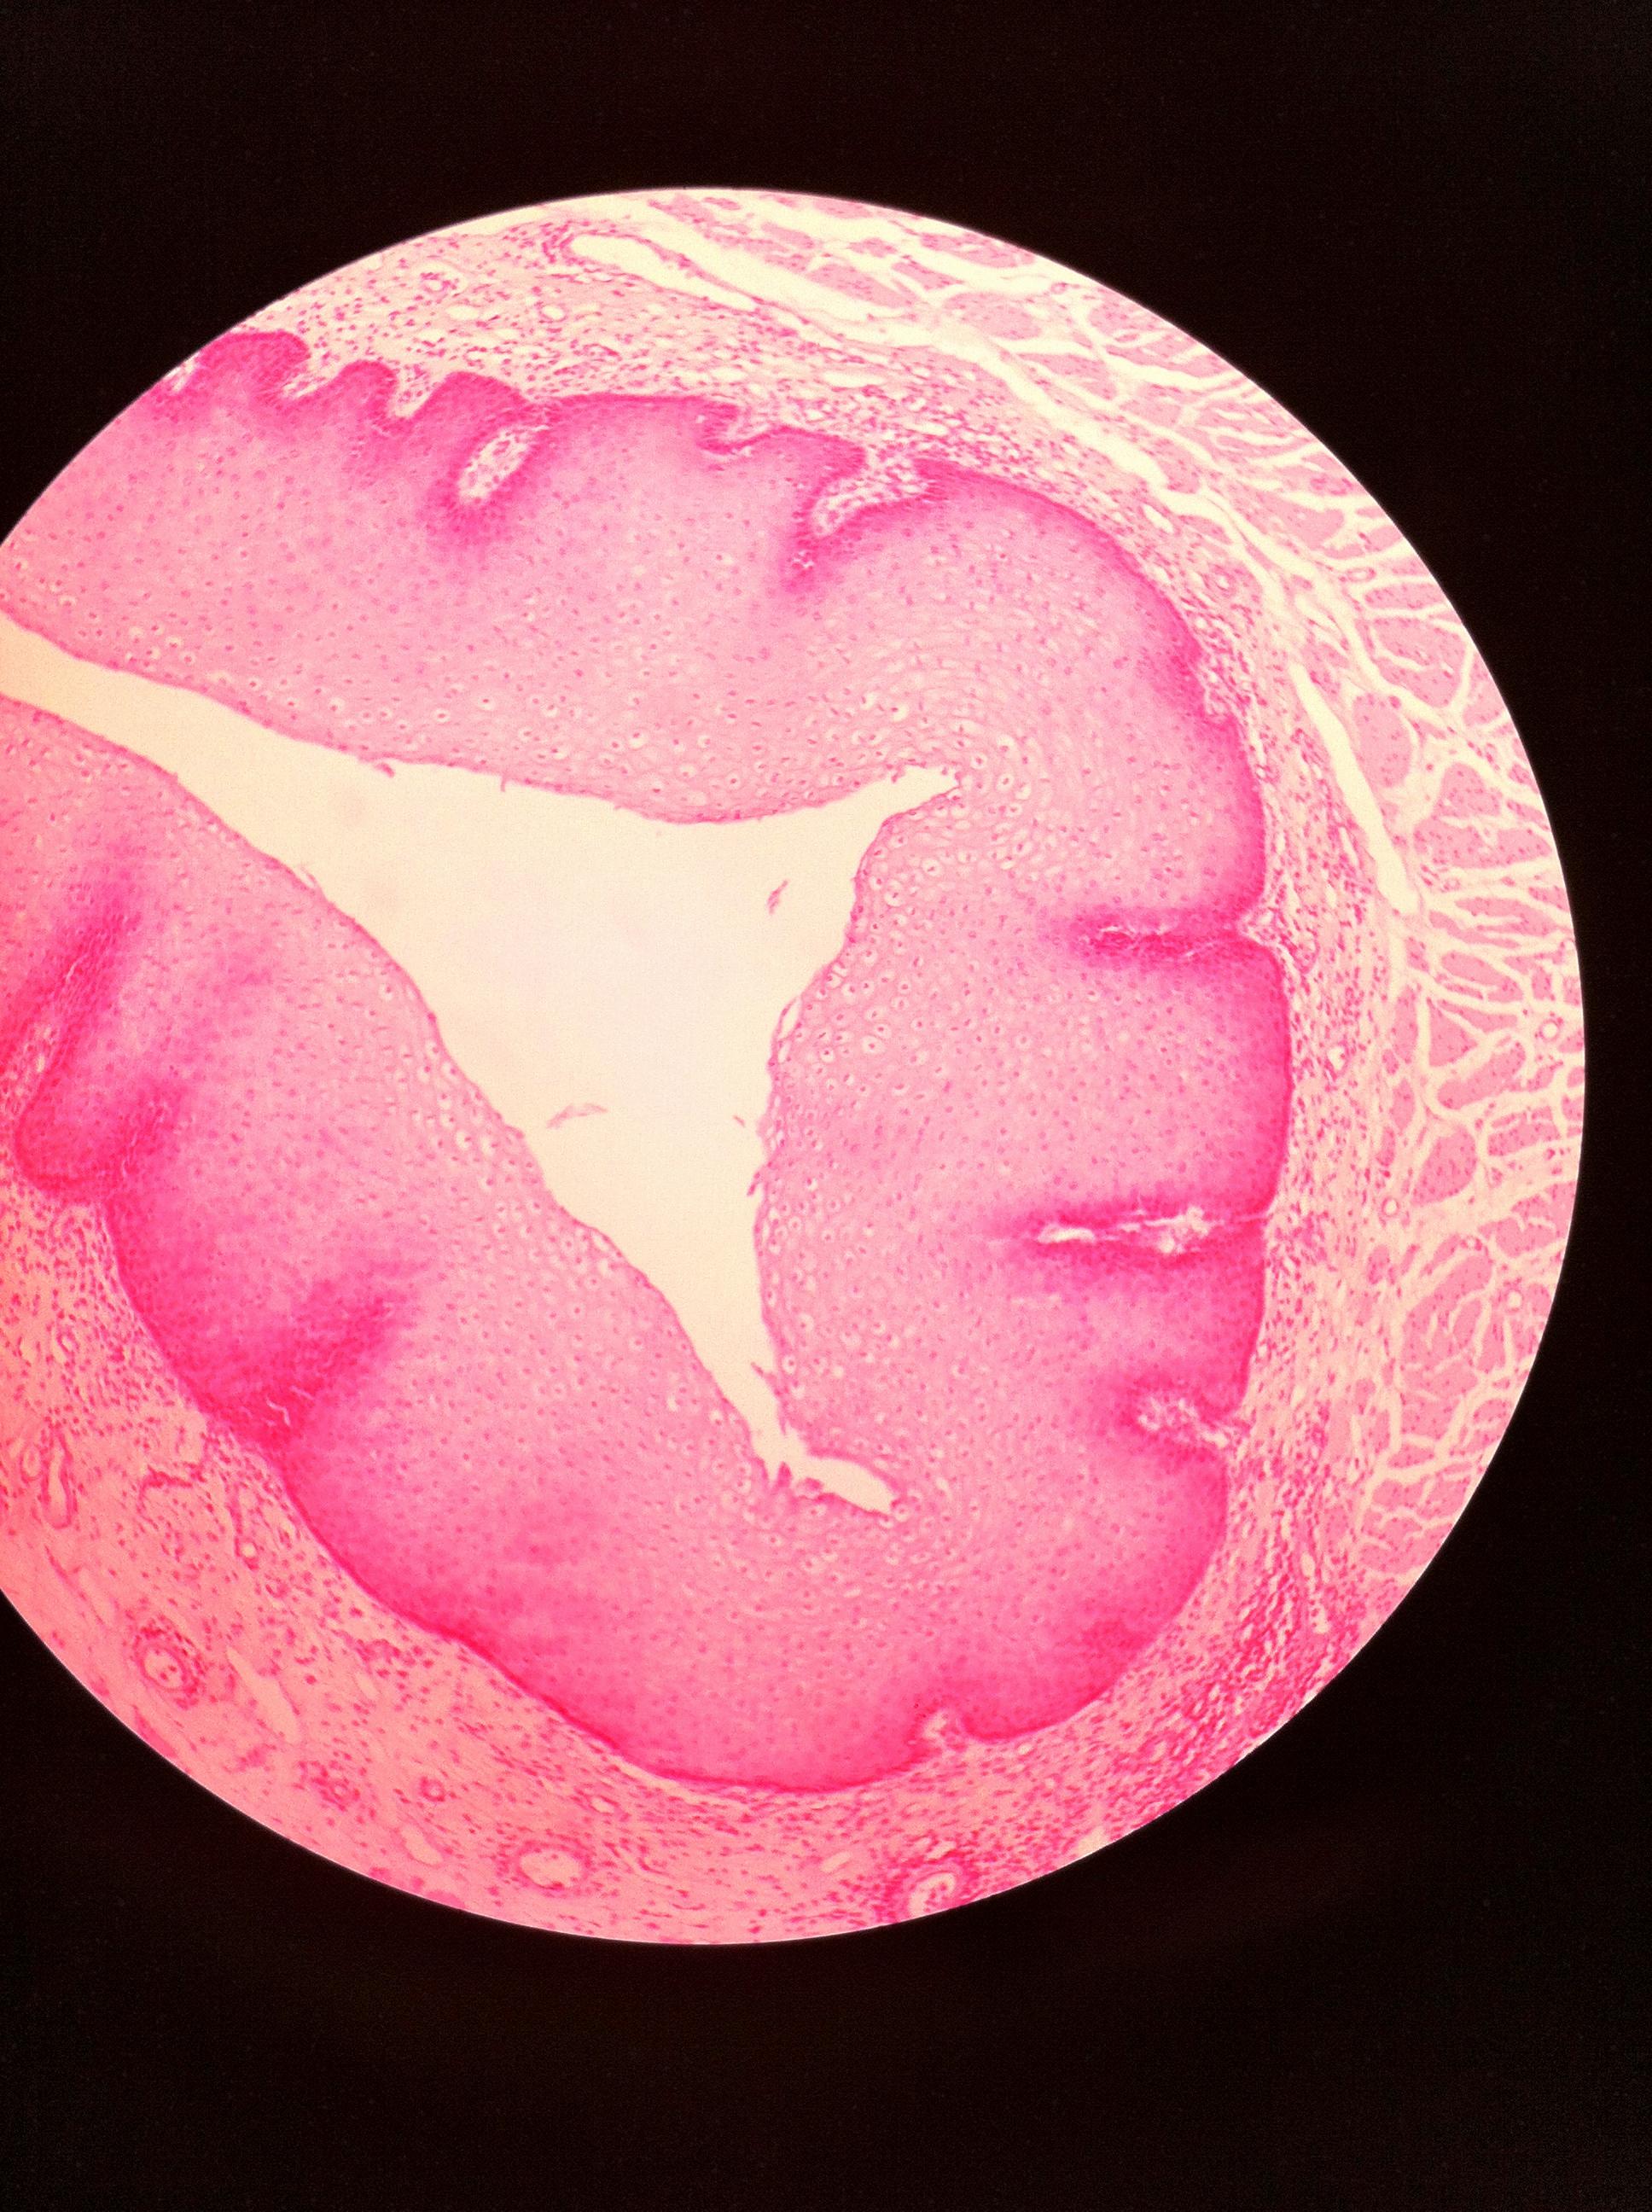 stratified squamos (esophagus) 100X